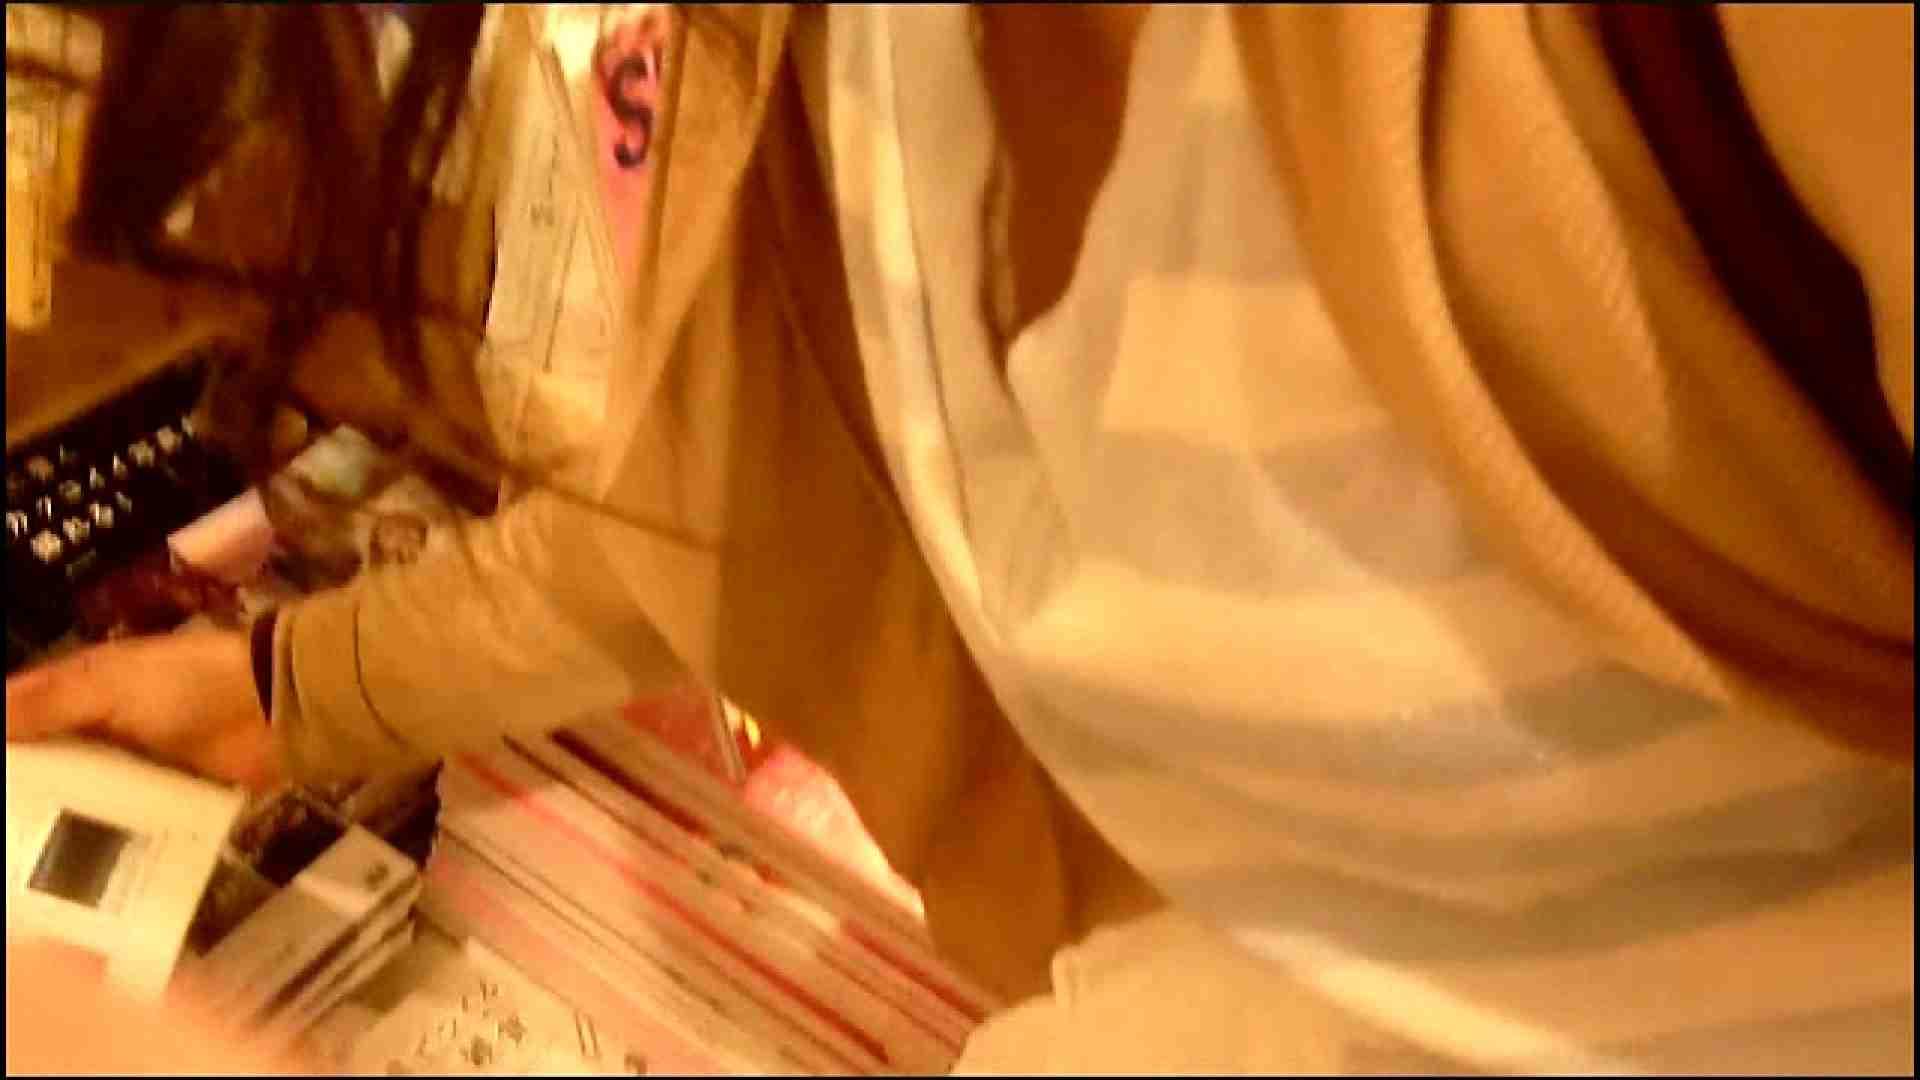 NO.3 某イオNN店内のエレベーター前でケータイに夢中な女の子 お姉さんの胸チラ  46画像 33